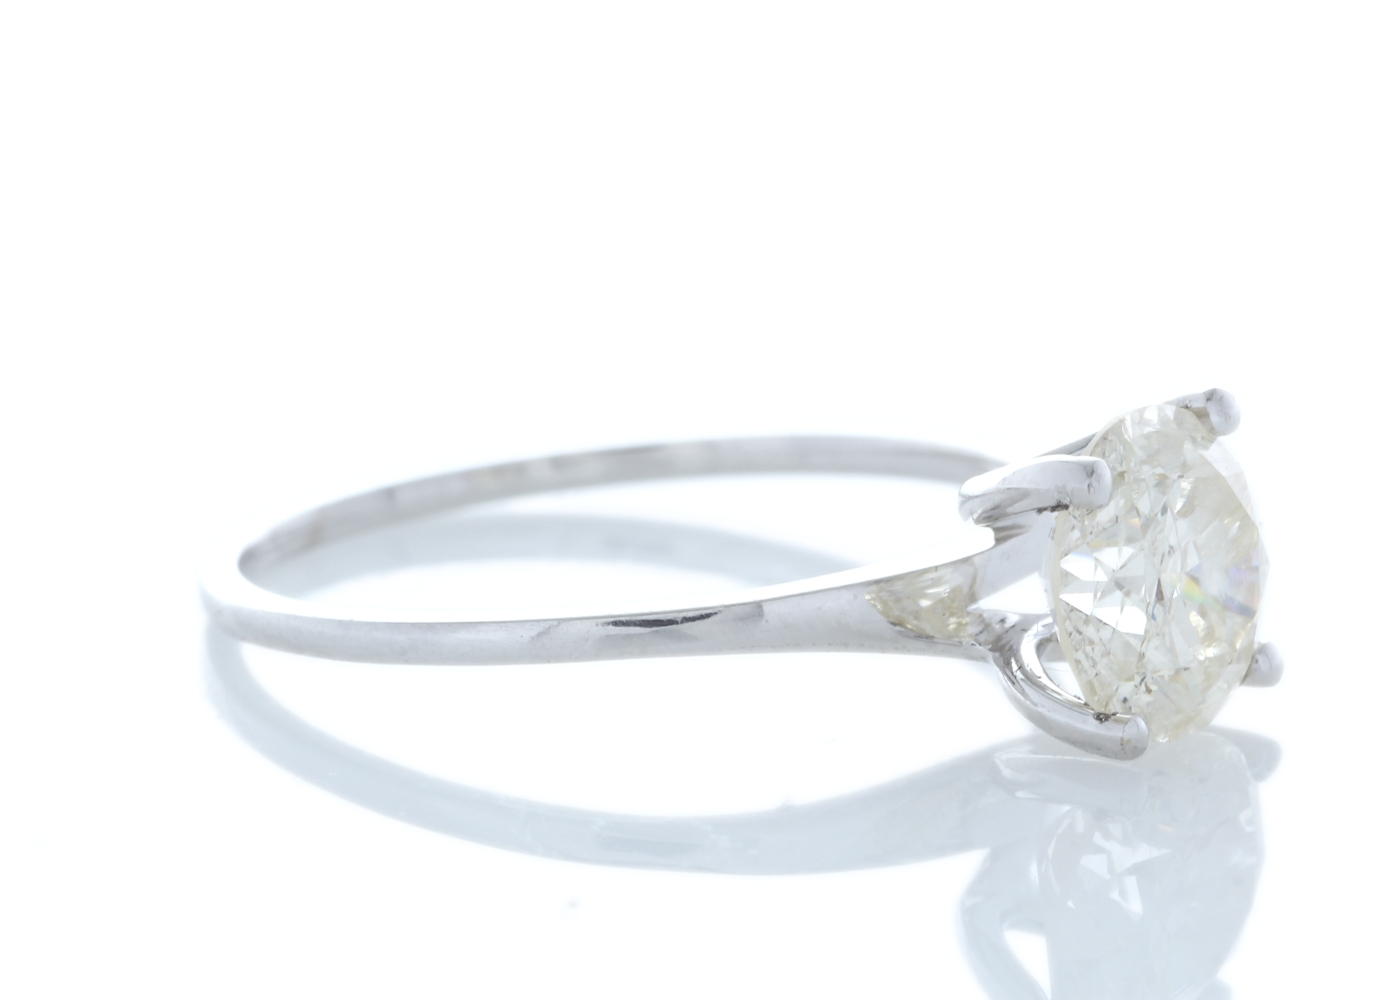 Lot 15 - 18ct White Gold Rex Set Diamond Ring 1.29 Carats